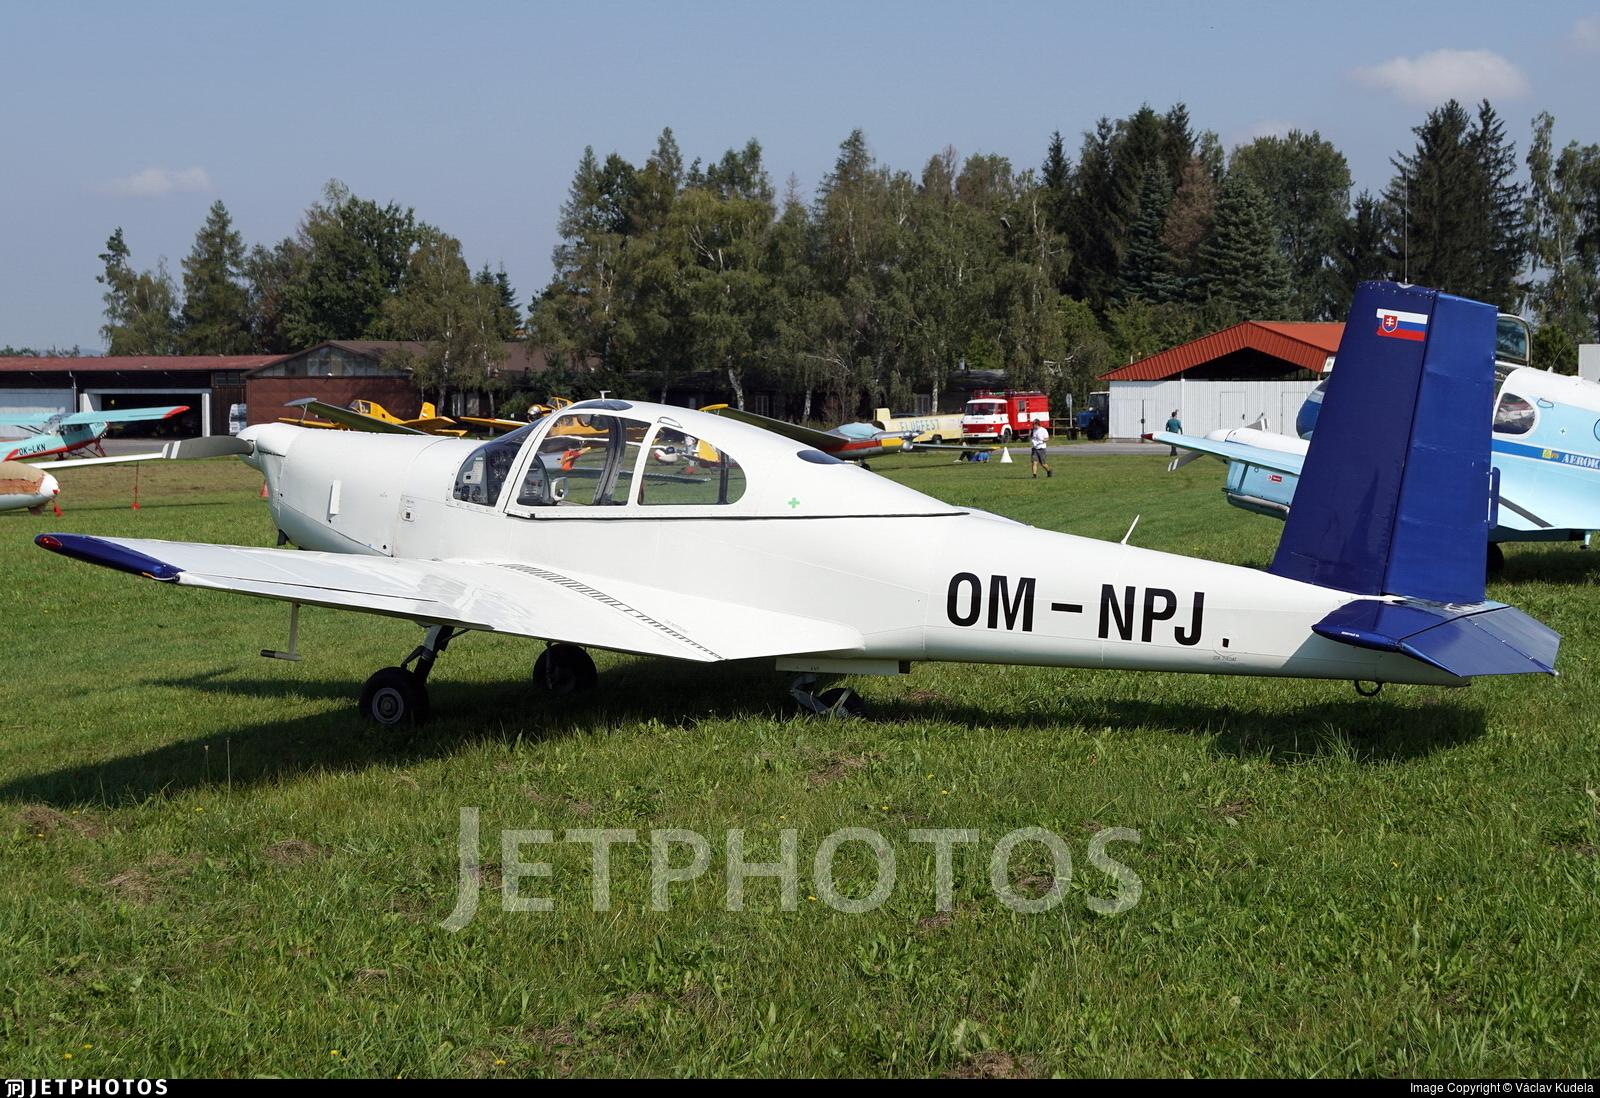 OM-NPJ - Orlican L-40 Meta-Sokol - Aero Club - Slovak Republic